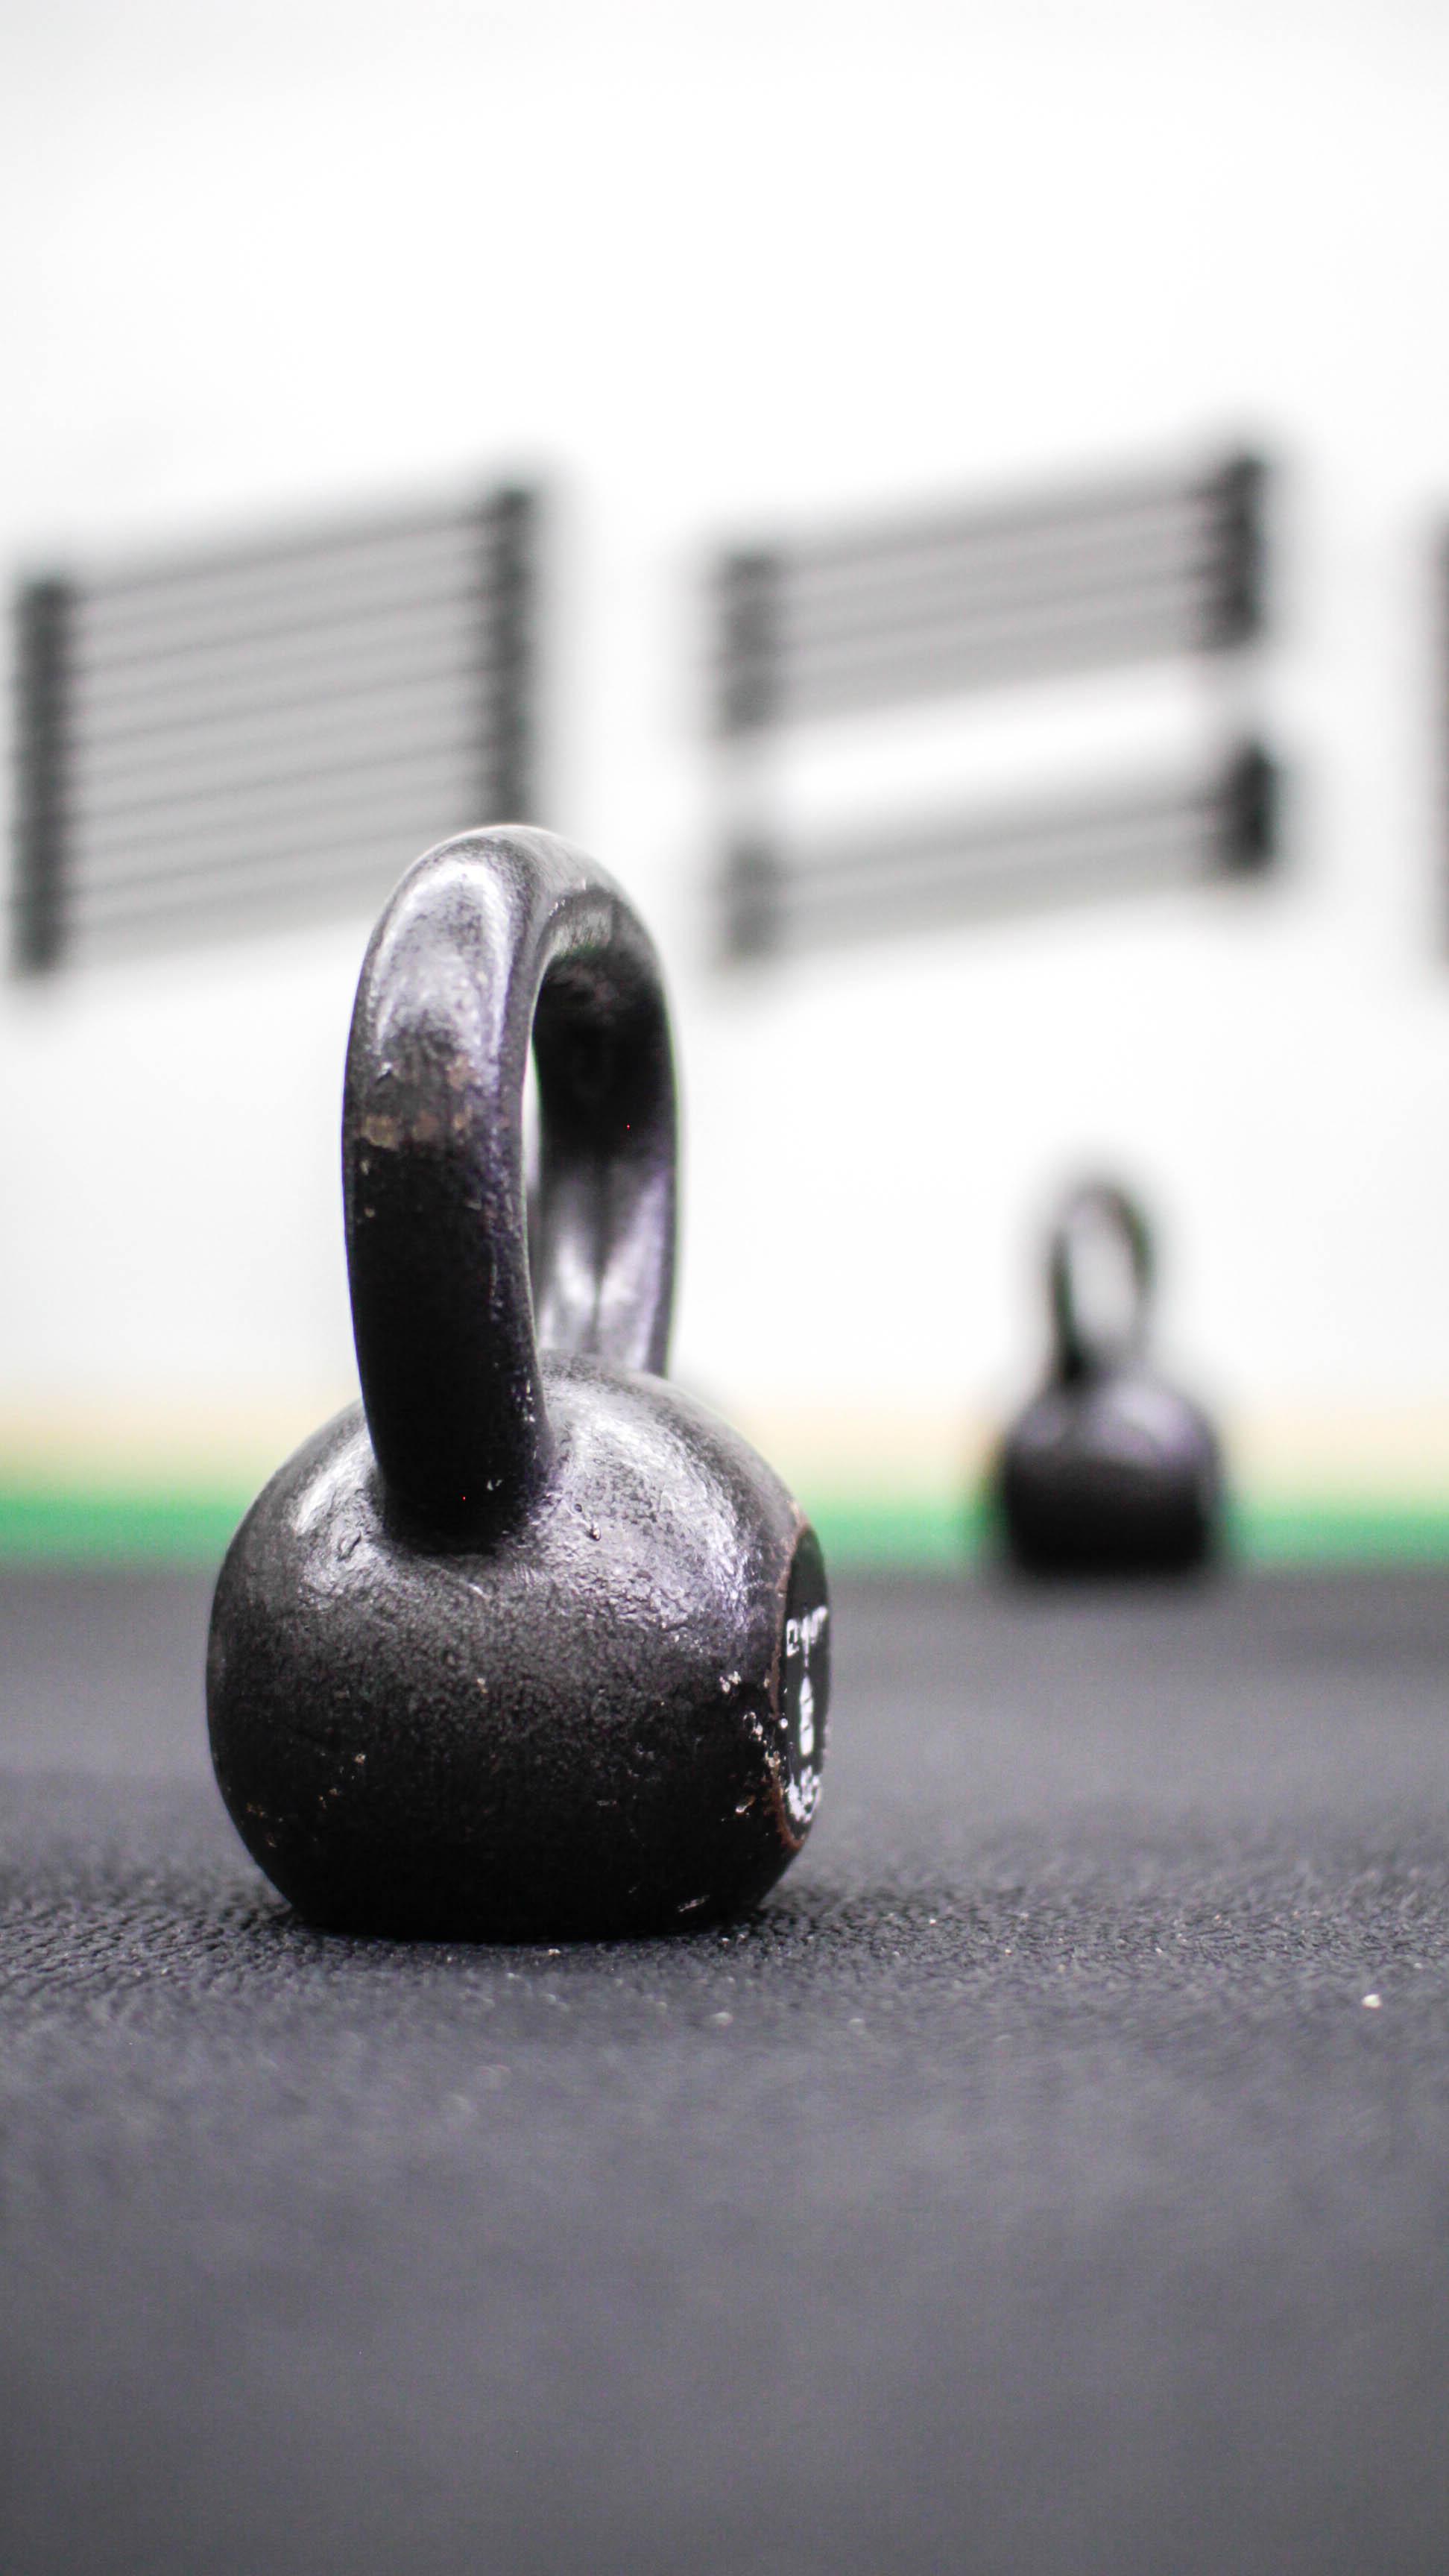 Fitness, athletics, health, and community